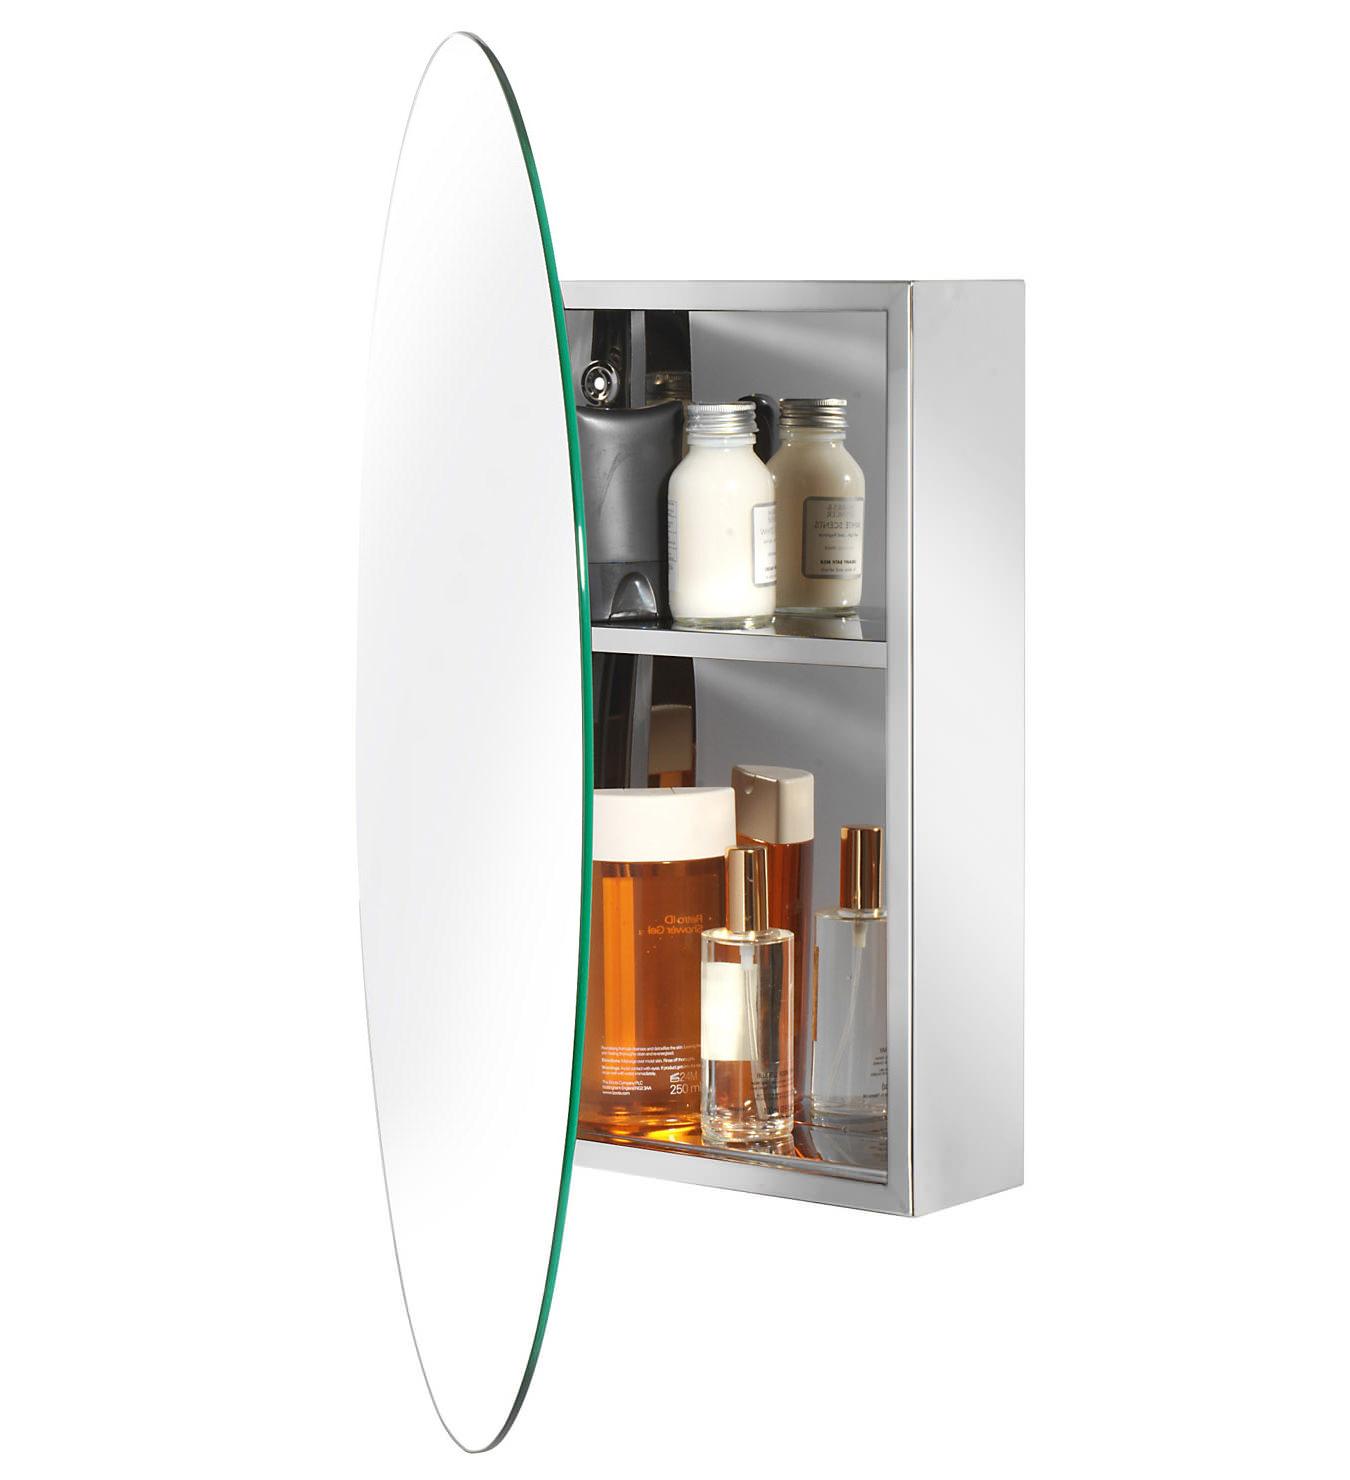 Croydex tay stainless steel oval door mirror cabinet wc870105 Oval bathroom mirror cabinet